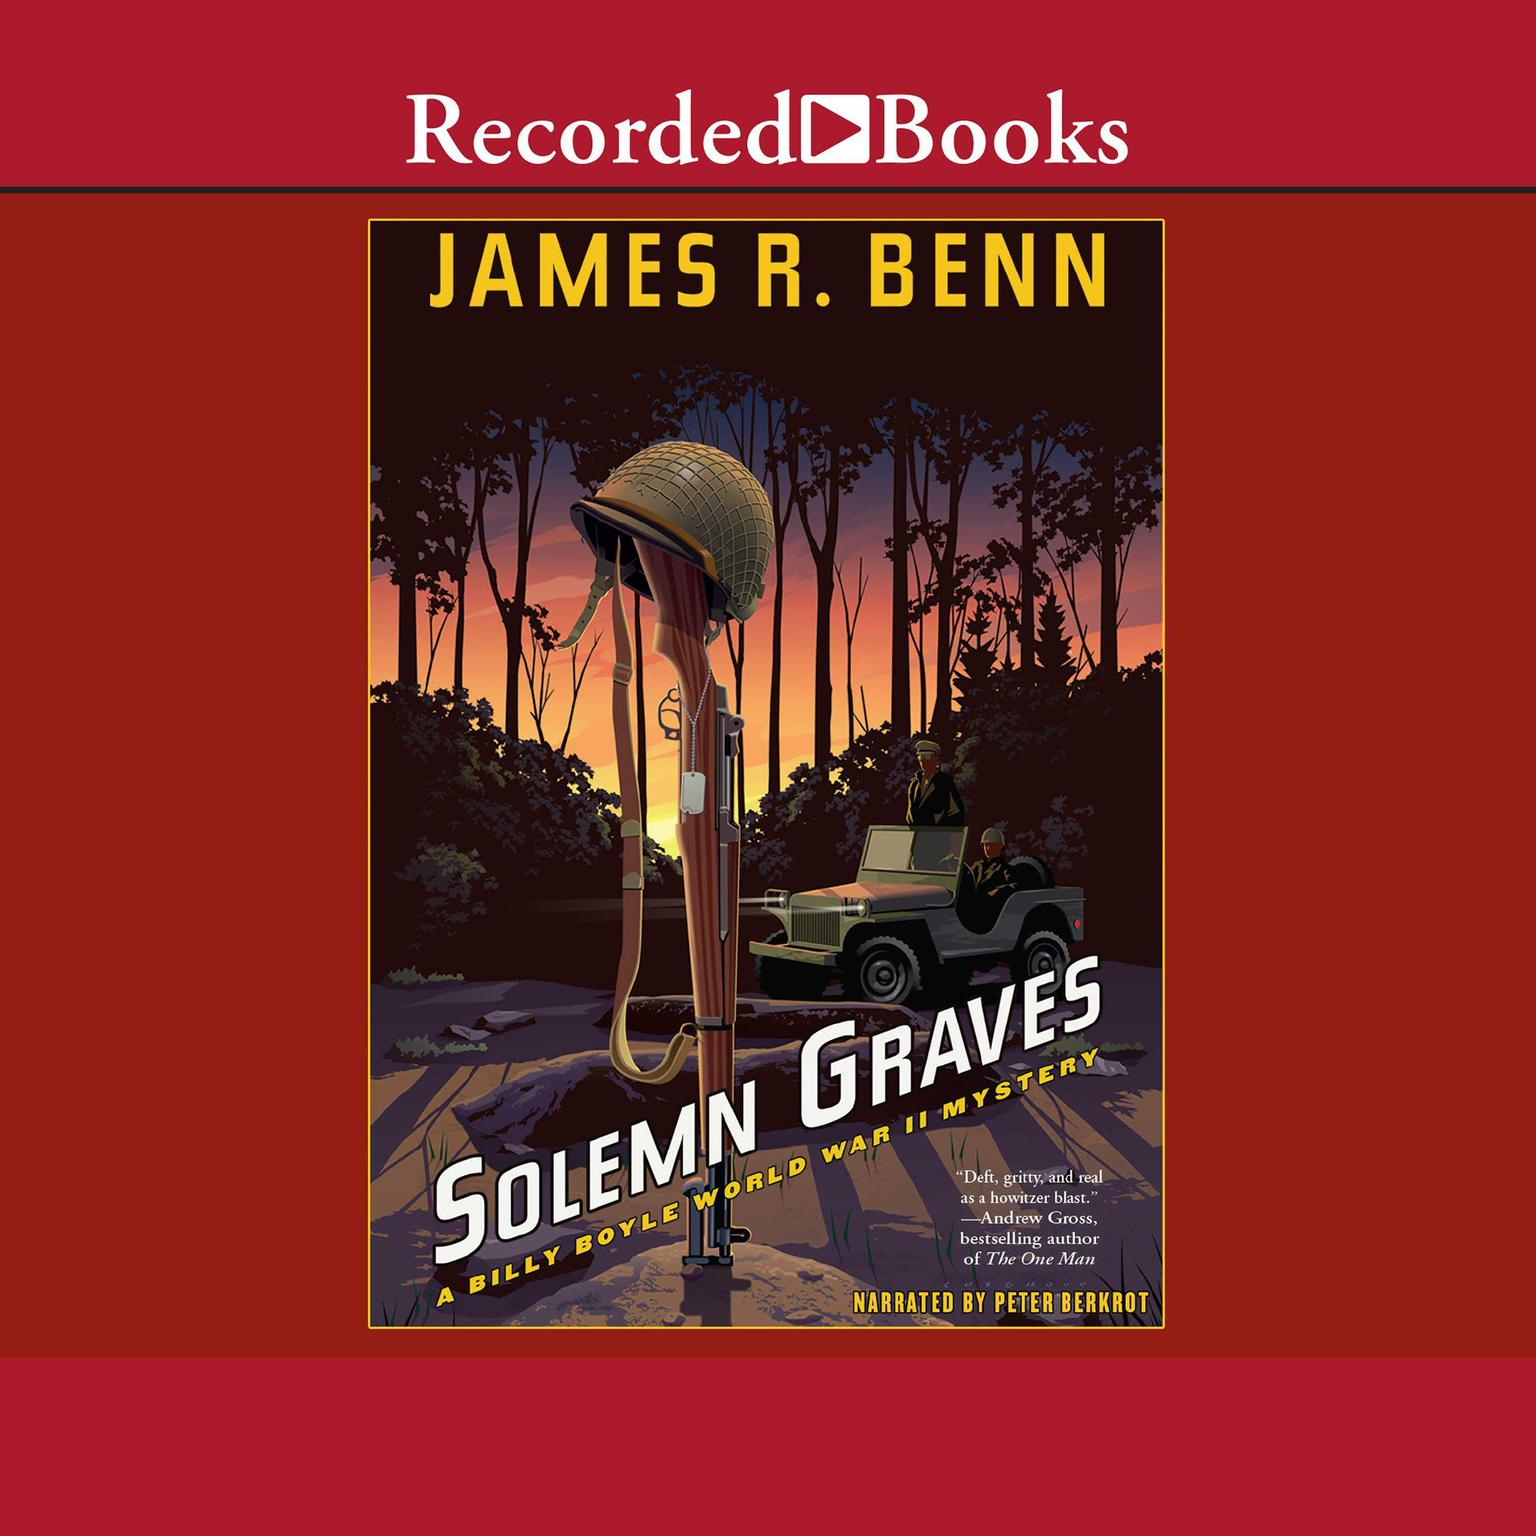 Solemn Graves Audiobook, by James R. Benn